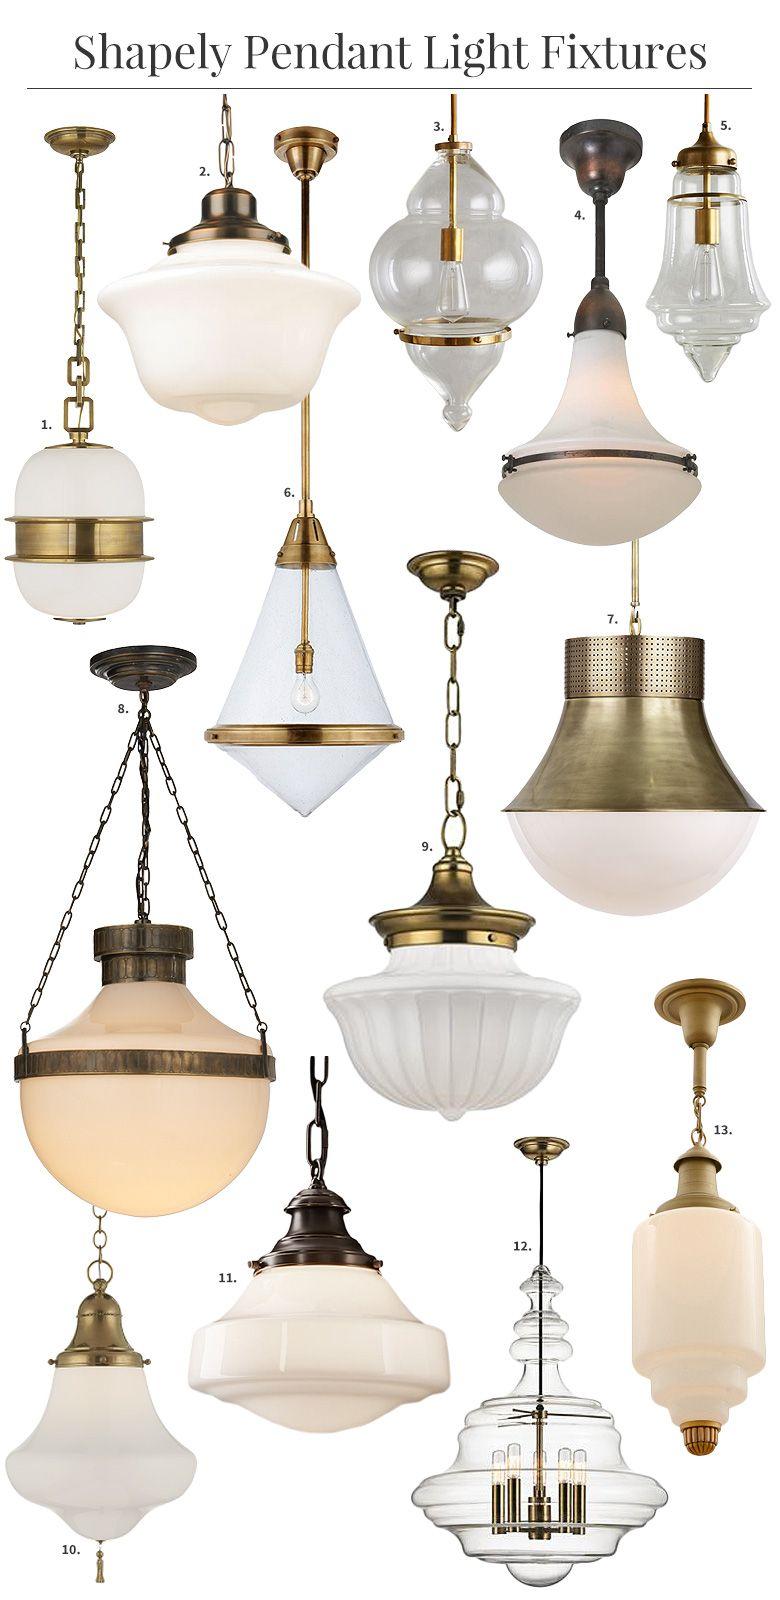 Shapely Glass Pendant Light Fixtures Glass Pendant Light Light